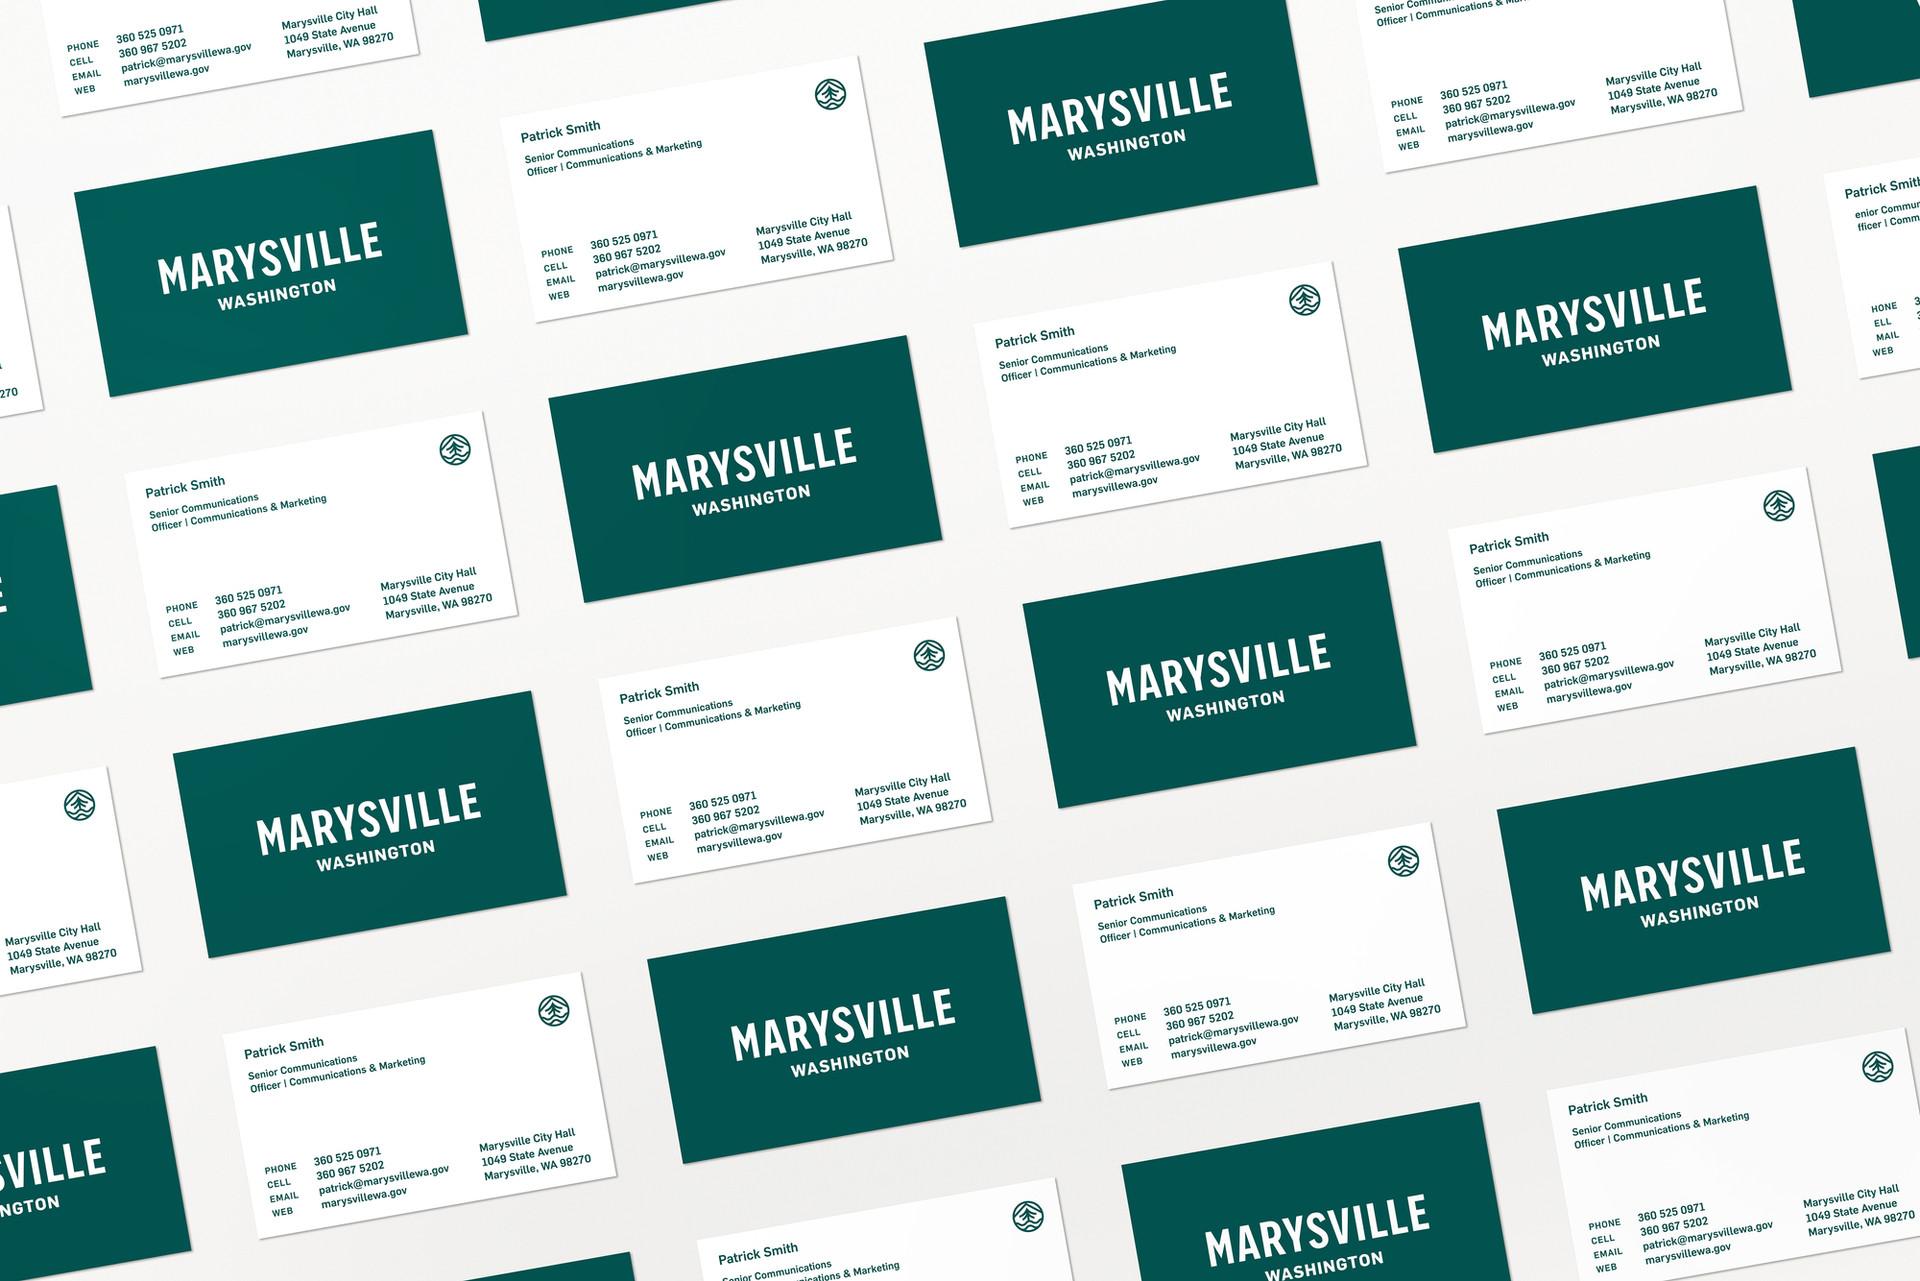 Marysville_6.jpg